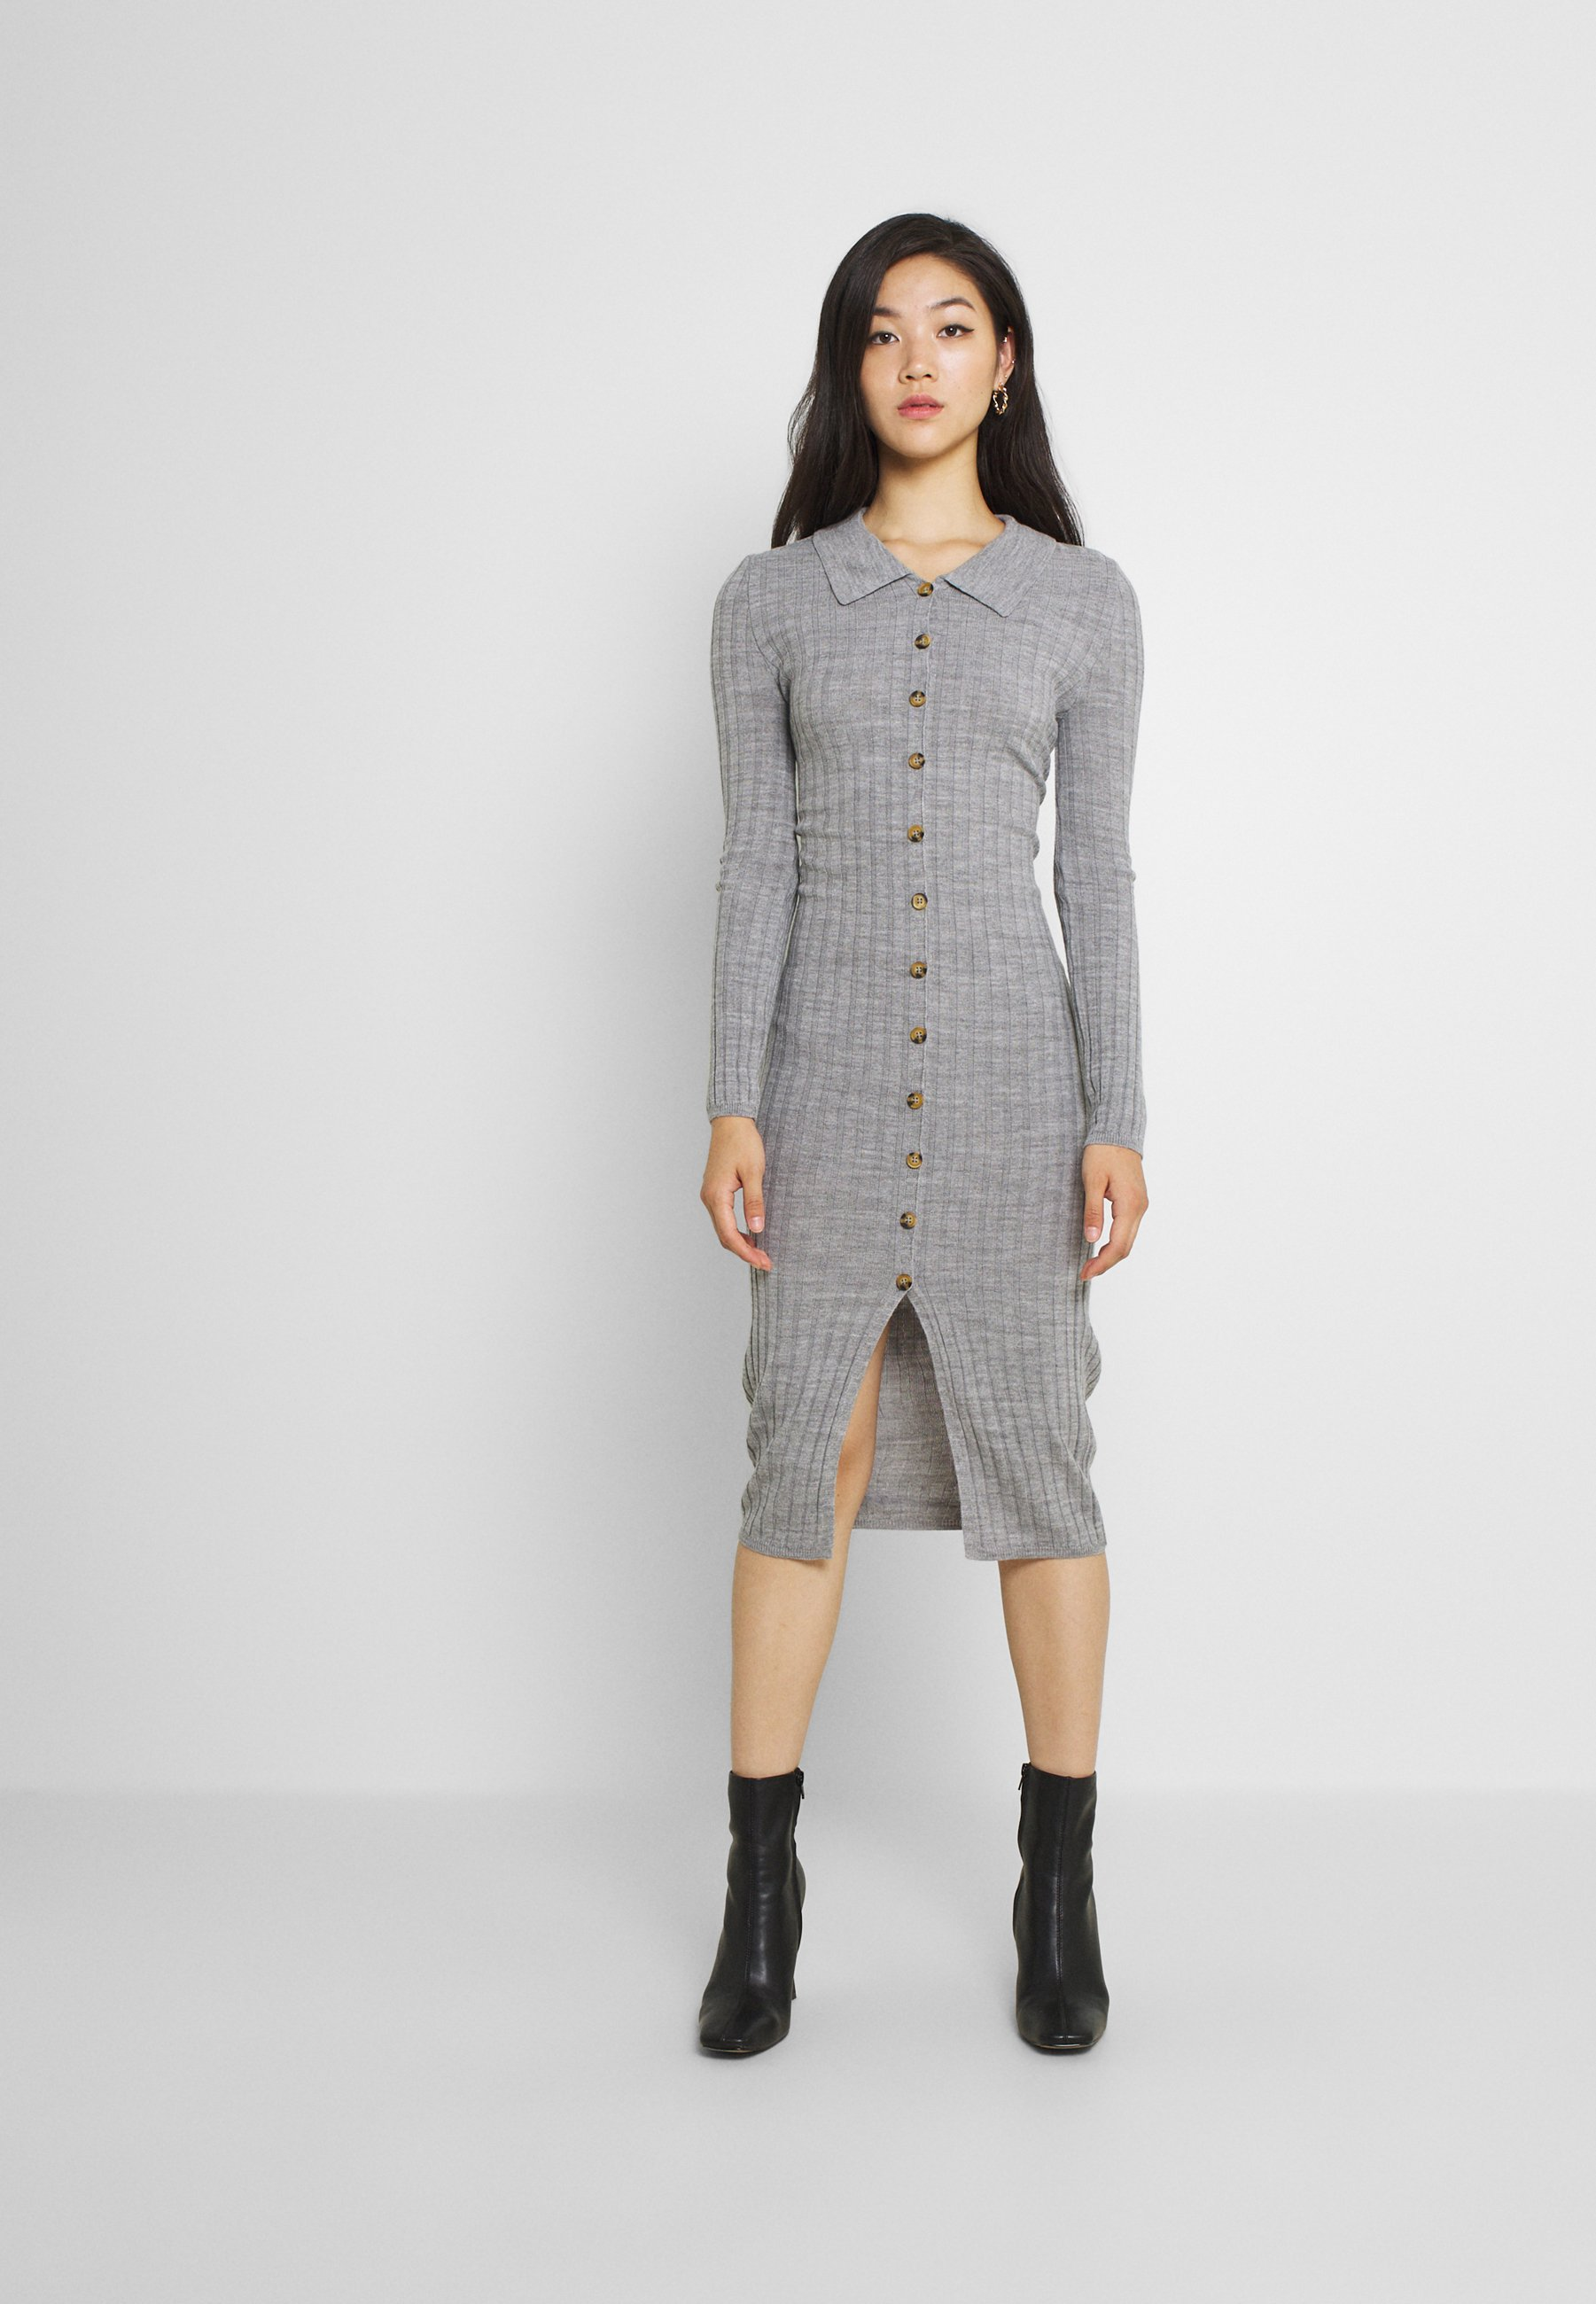 Femme VITINA  BUTTON DRESS - Robe pull